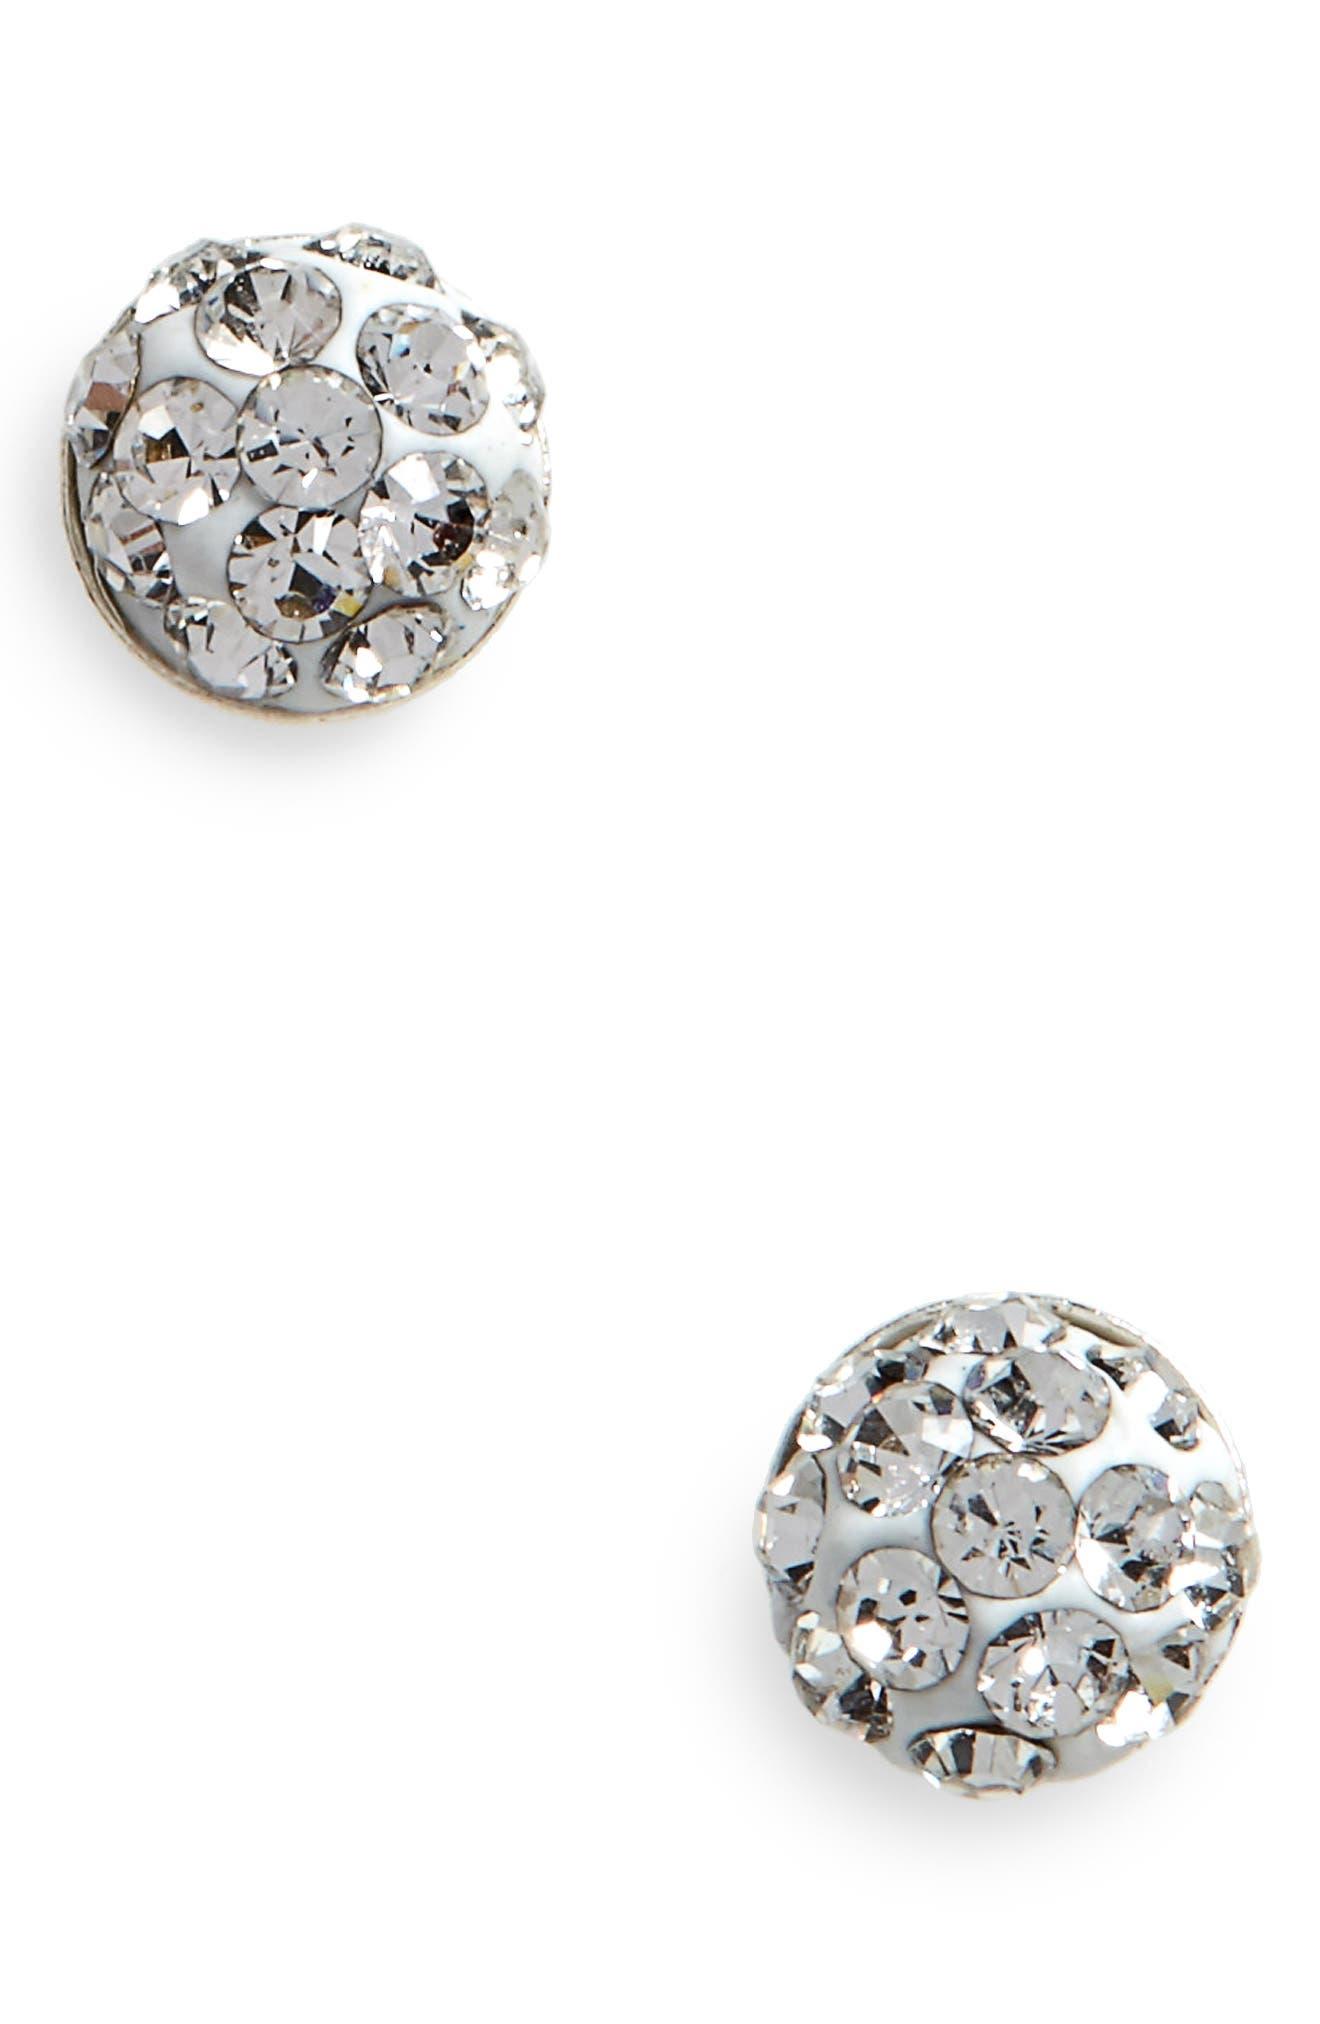 Crystal & Sterling Silver Stud Earrings,                             Main thumbnail 1, color,